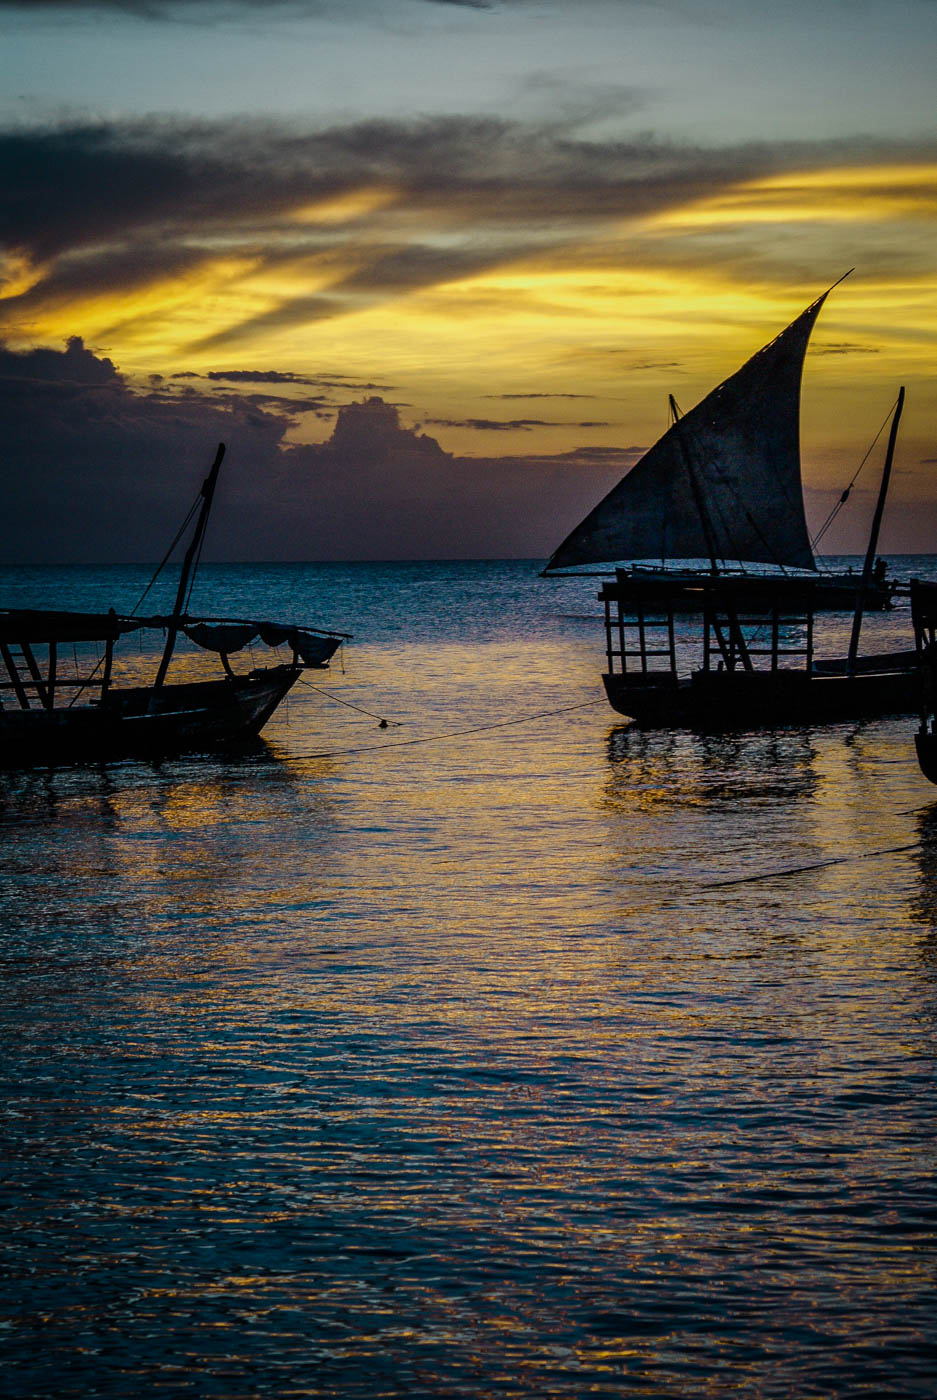 Sunset in Stone Town - Tanzania and Zanzibar - an exotic adventure. Beaches I Stone Town I Africa Travel I Dar Es Salaam #traveldestinations #traveltheworld #tanzania